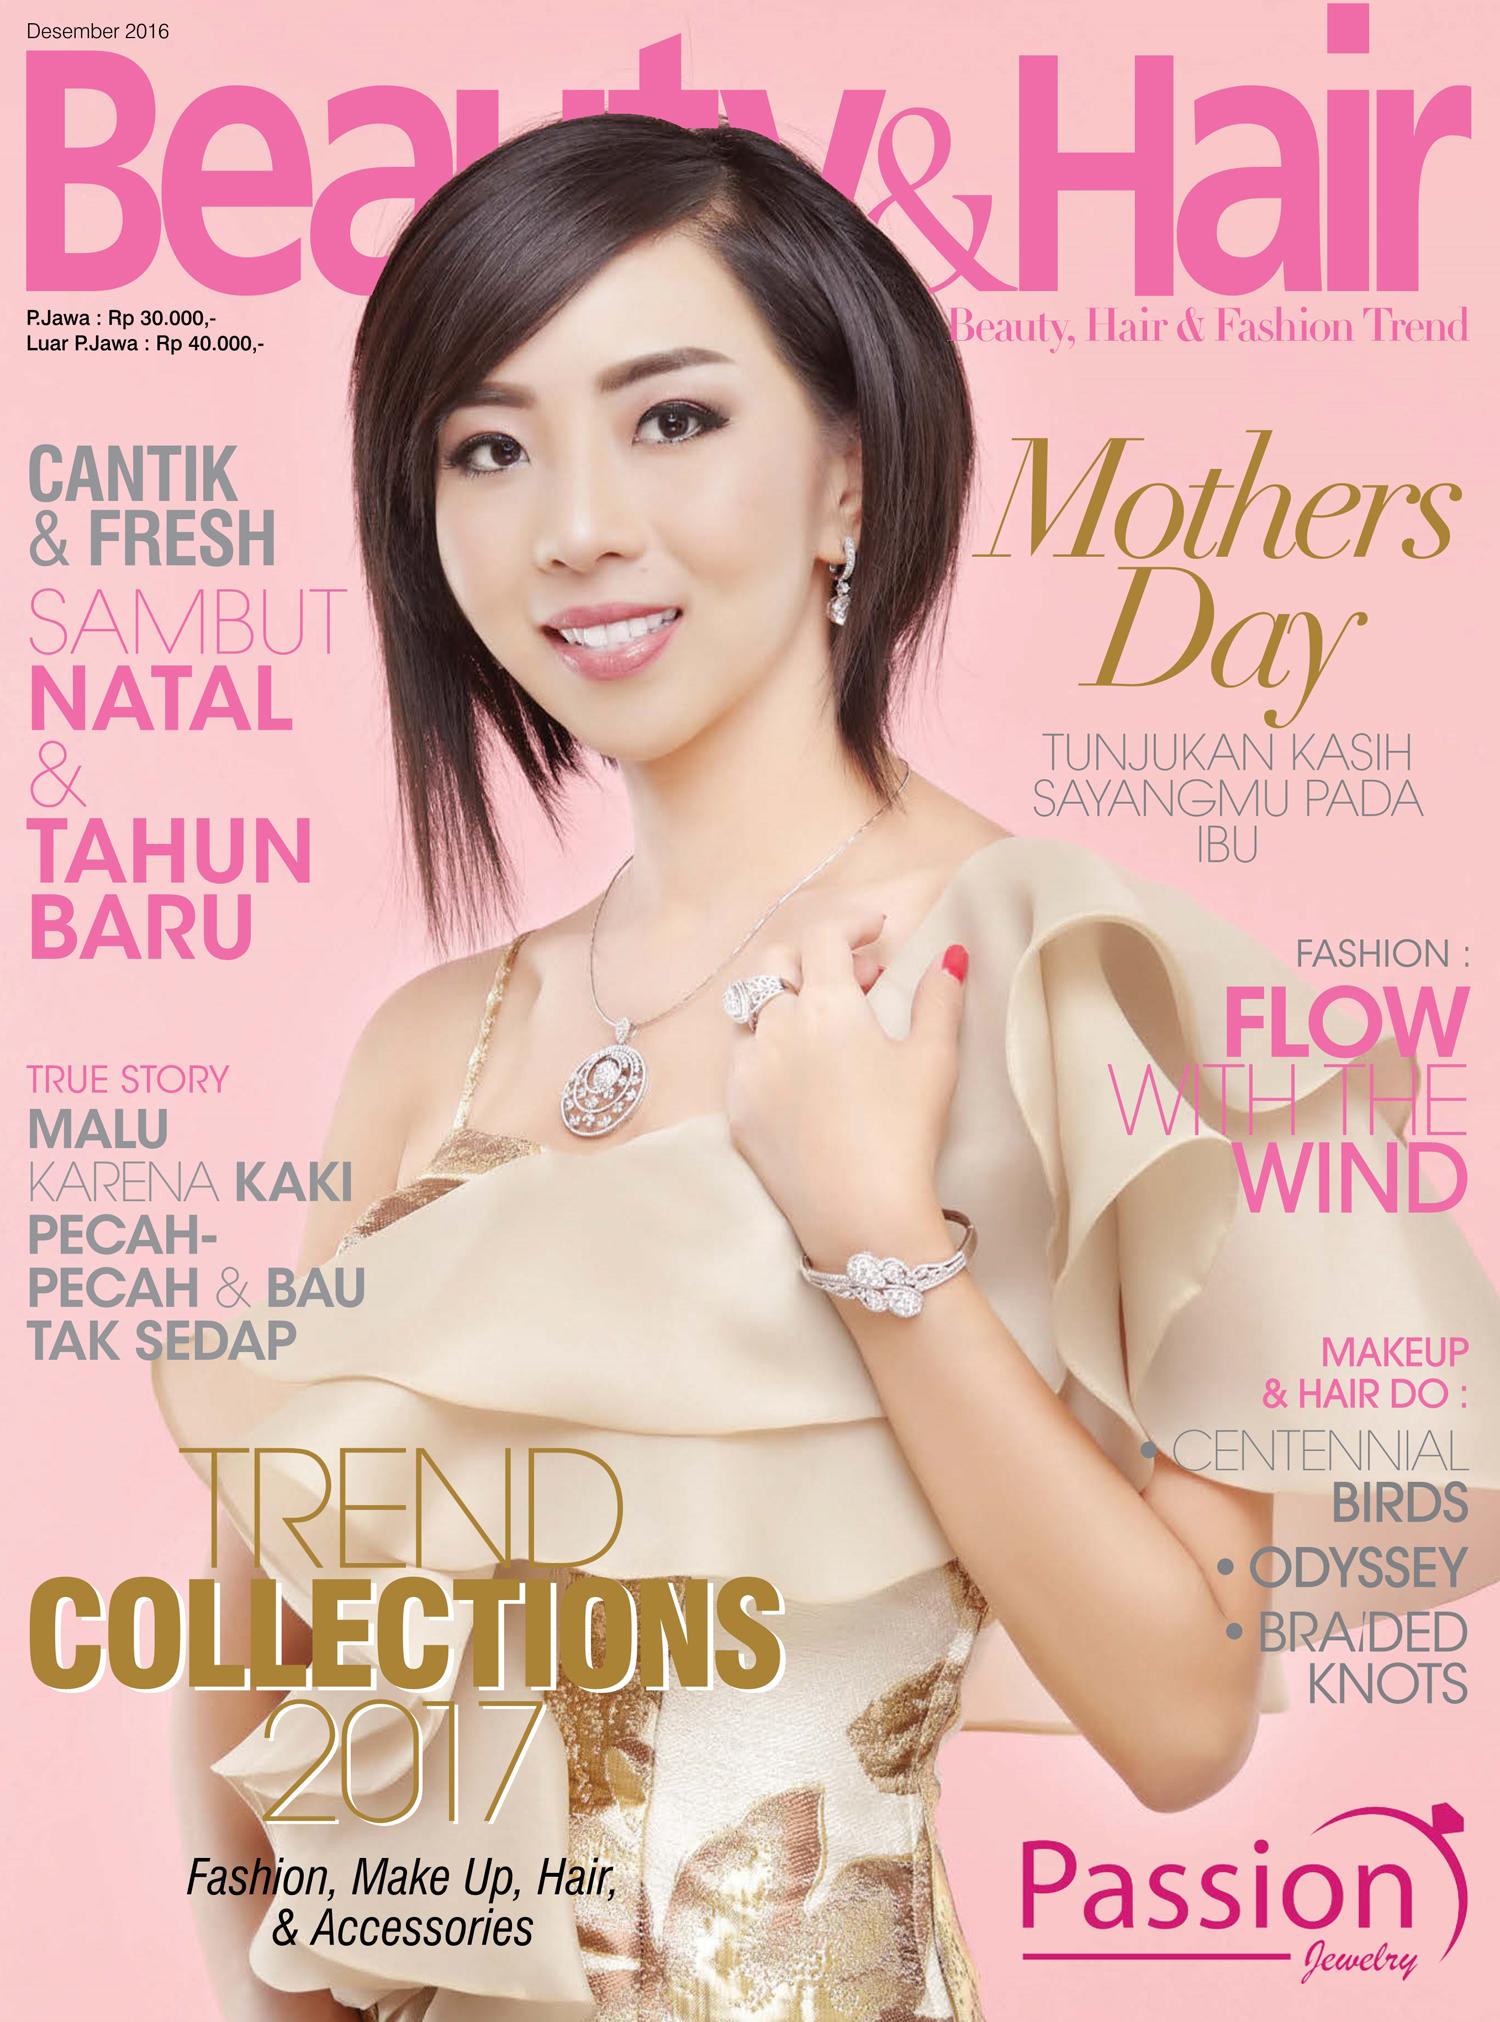 yoshikohair_stkilda_melbourne_hairdresser_hairsalon_hair&beauty16_cover